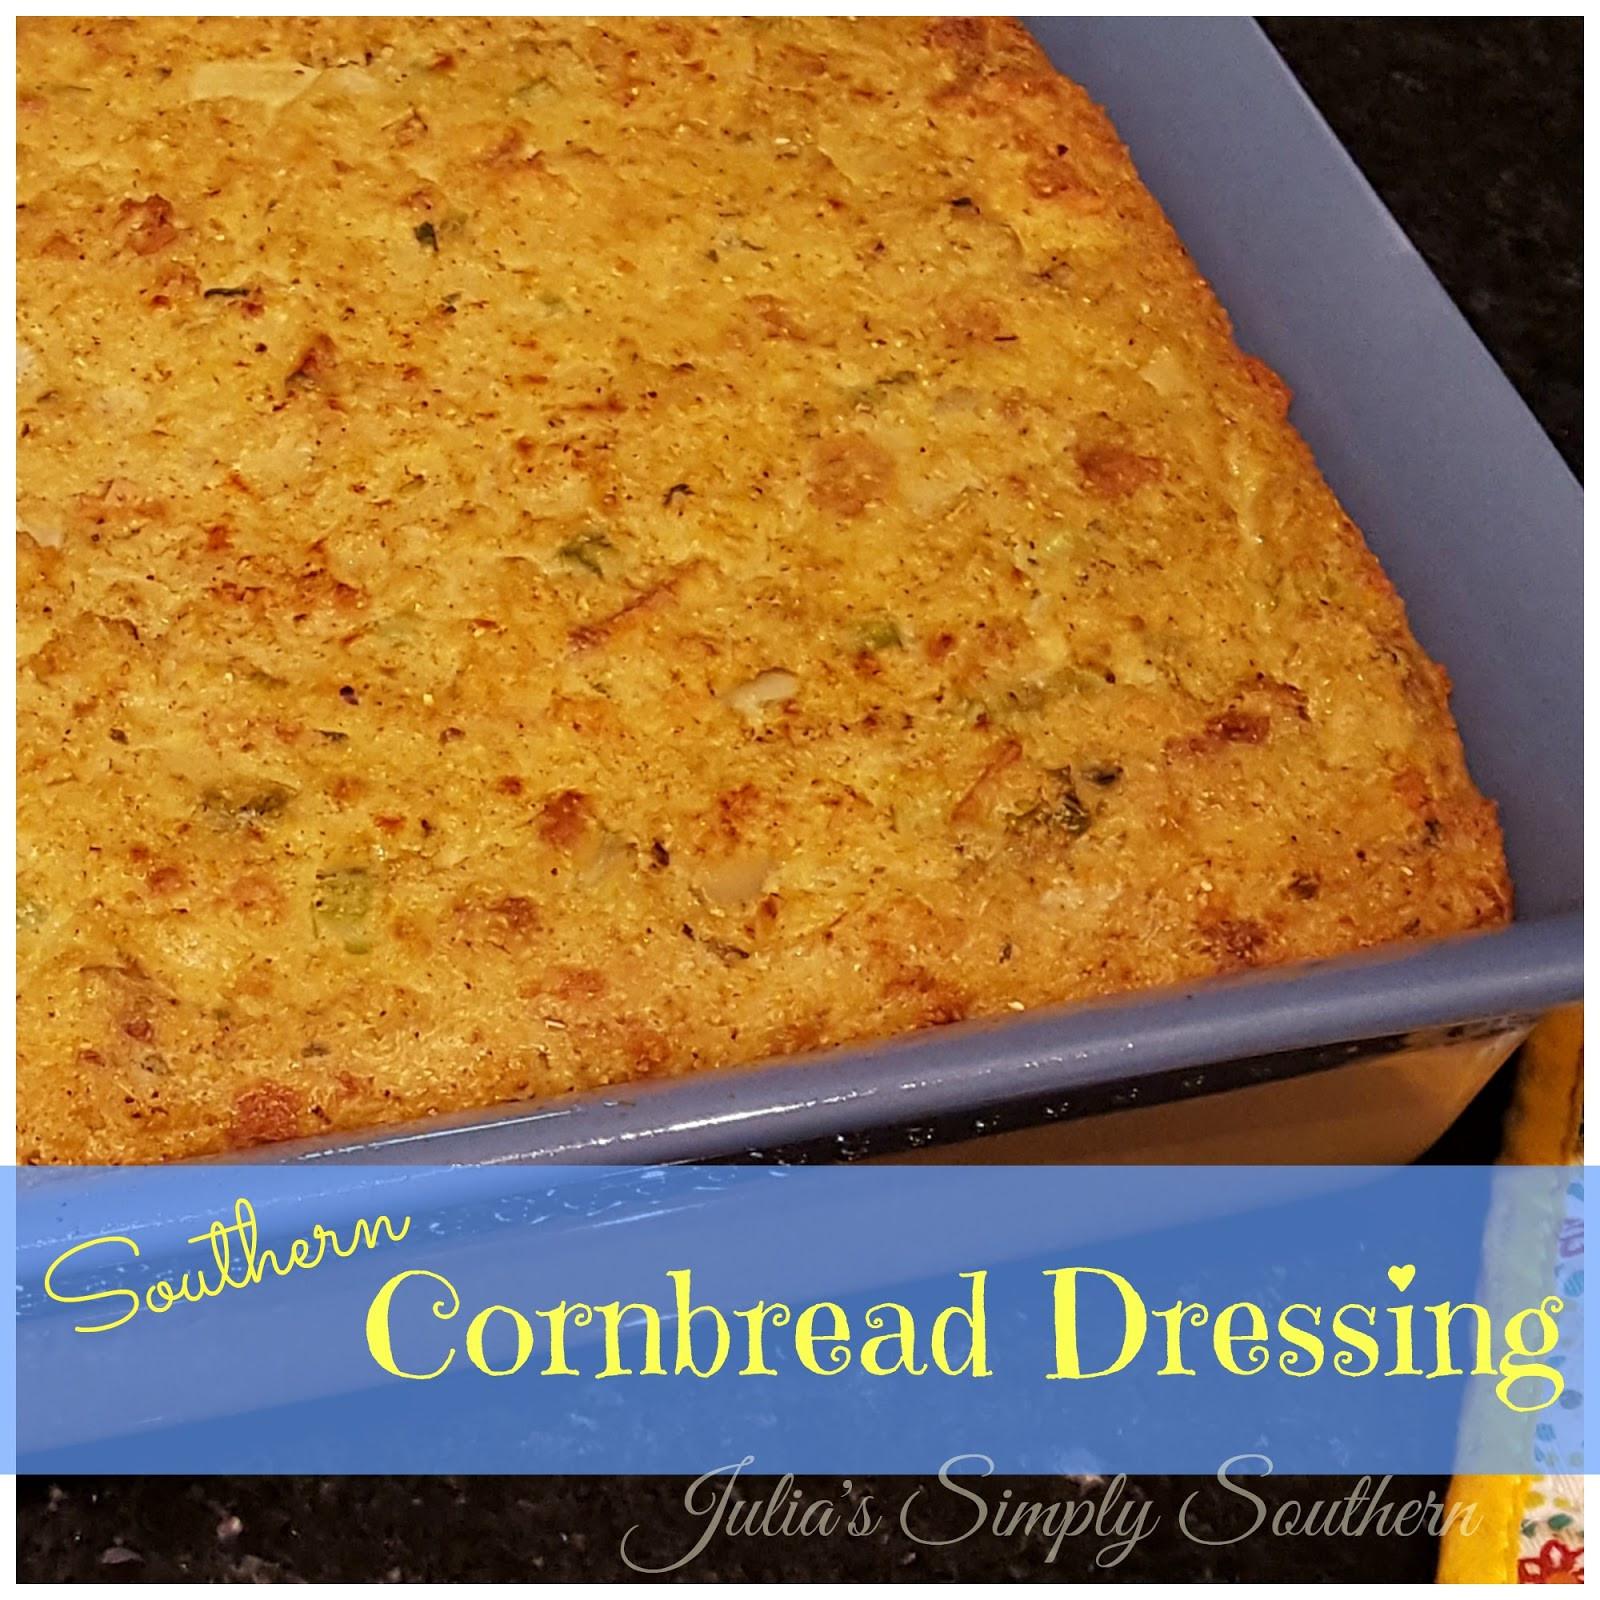 Southern Cornbread Dressing Recipe  Julia s Simply Southern Southern Cornbread Dressing